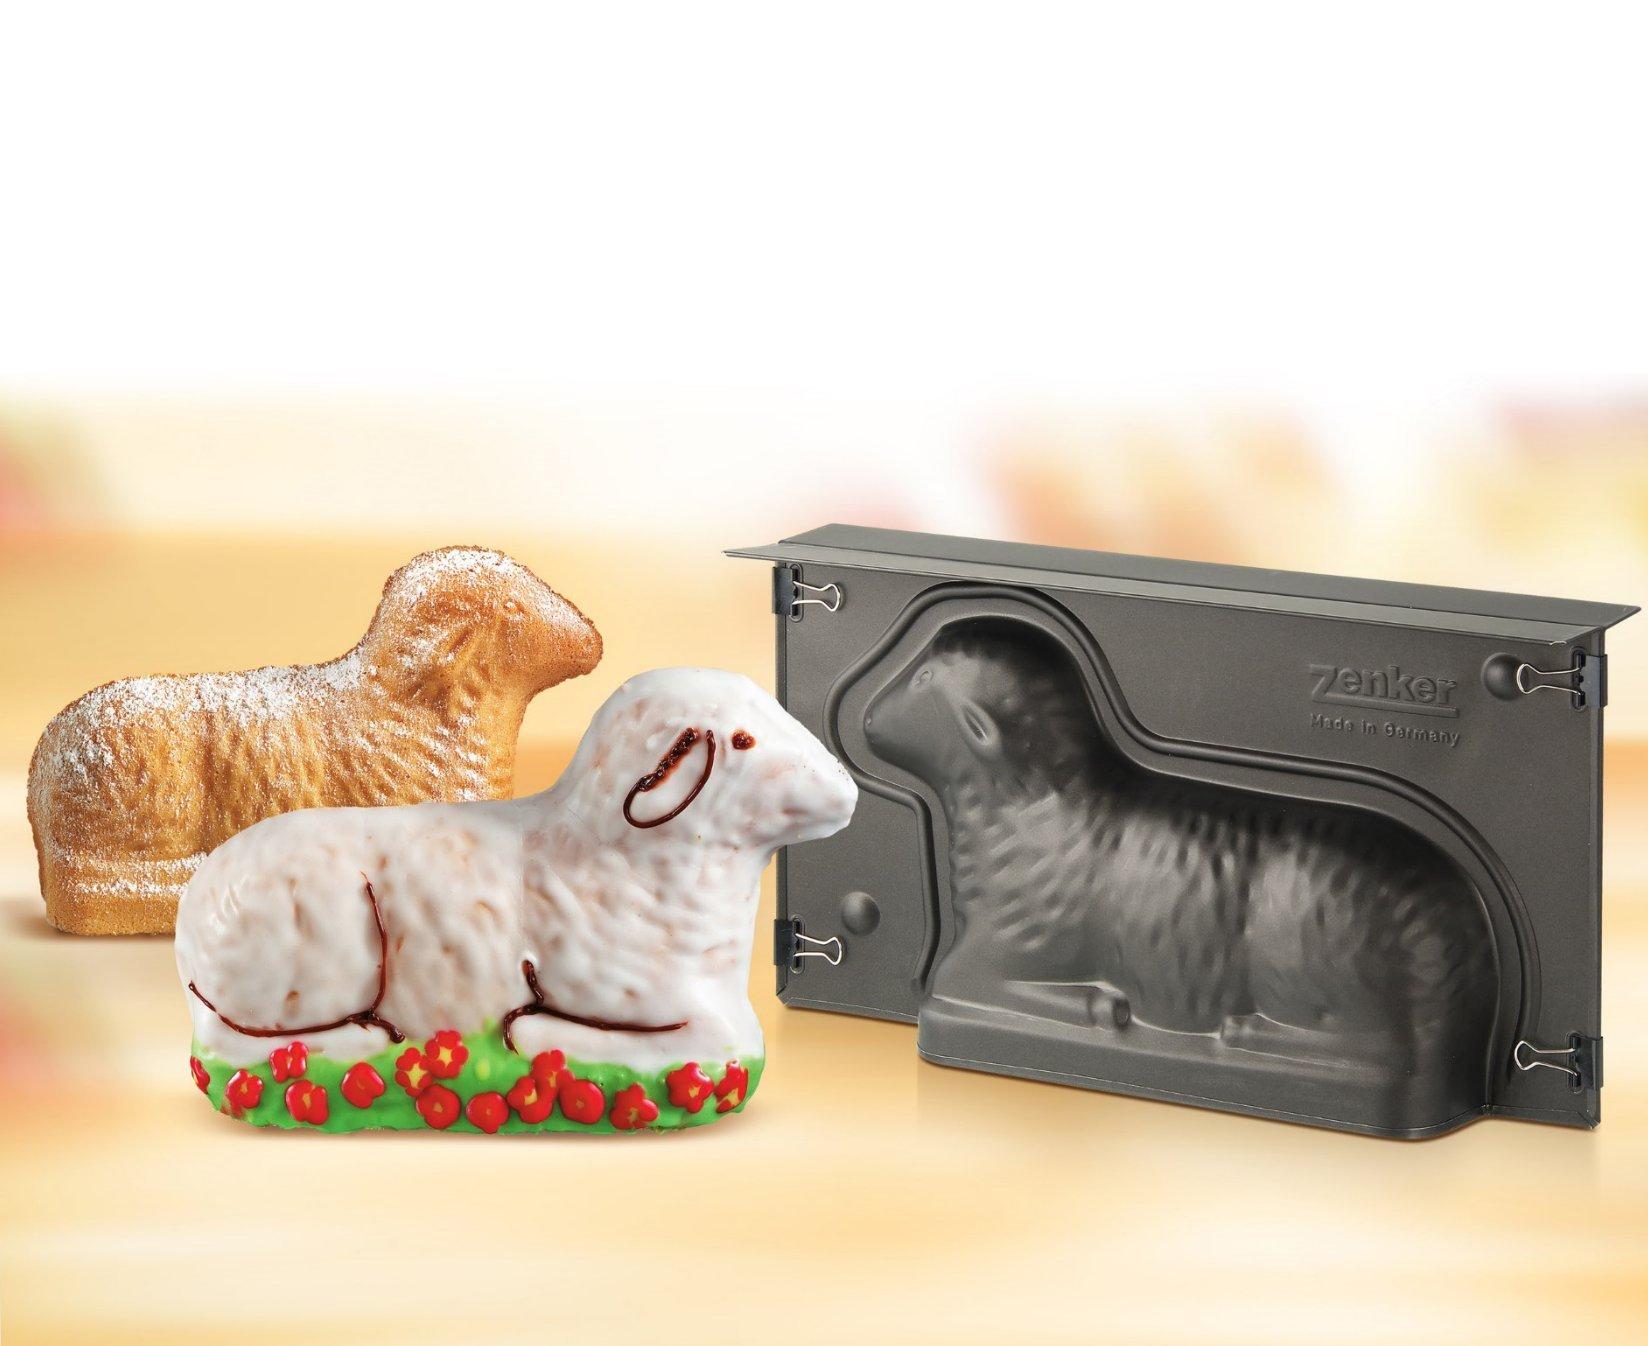 Zenker 9101''Special Season'' Lamb-Baking Tin, Black, 10.83 x 5.90 x 2.56'' by Zenker (Image #5)